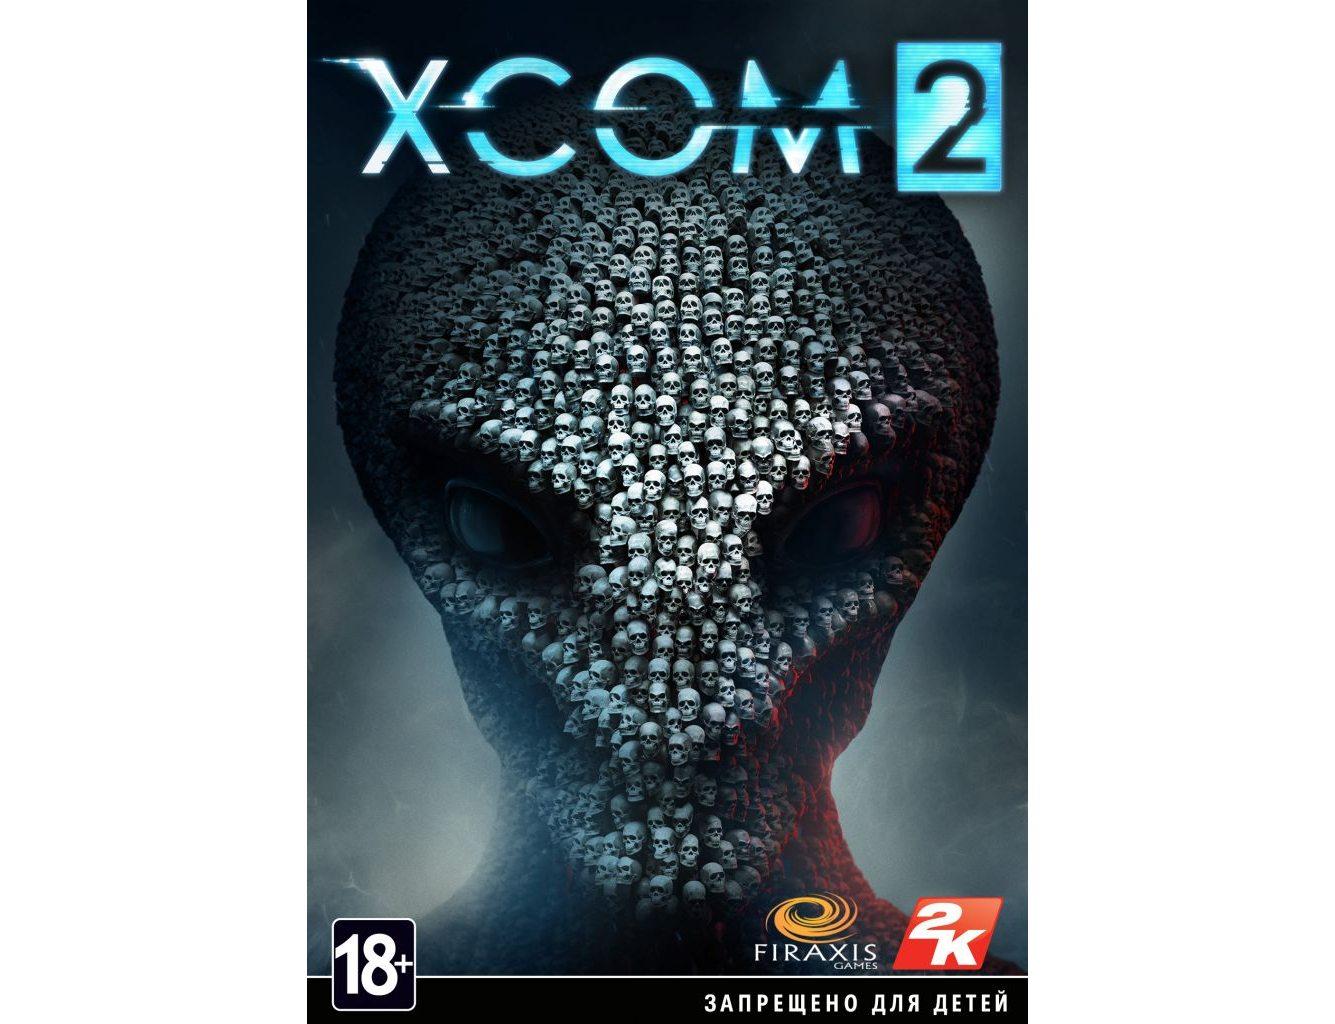 PC XCOM 2 PC